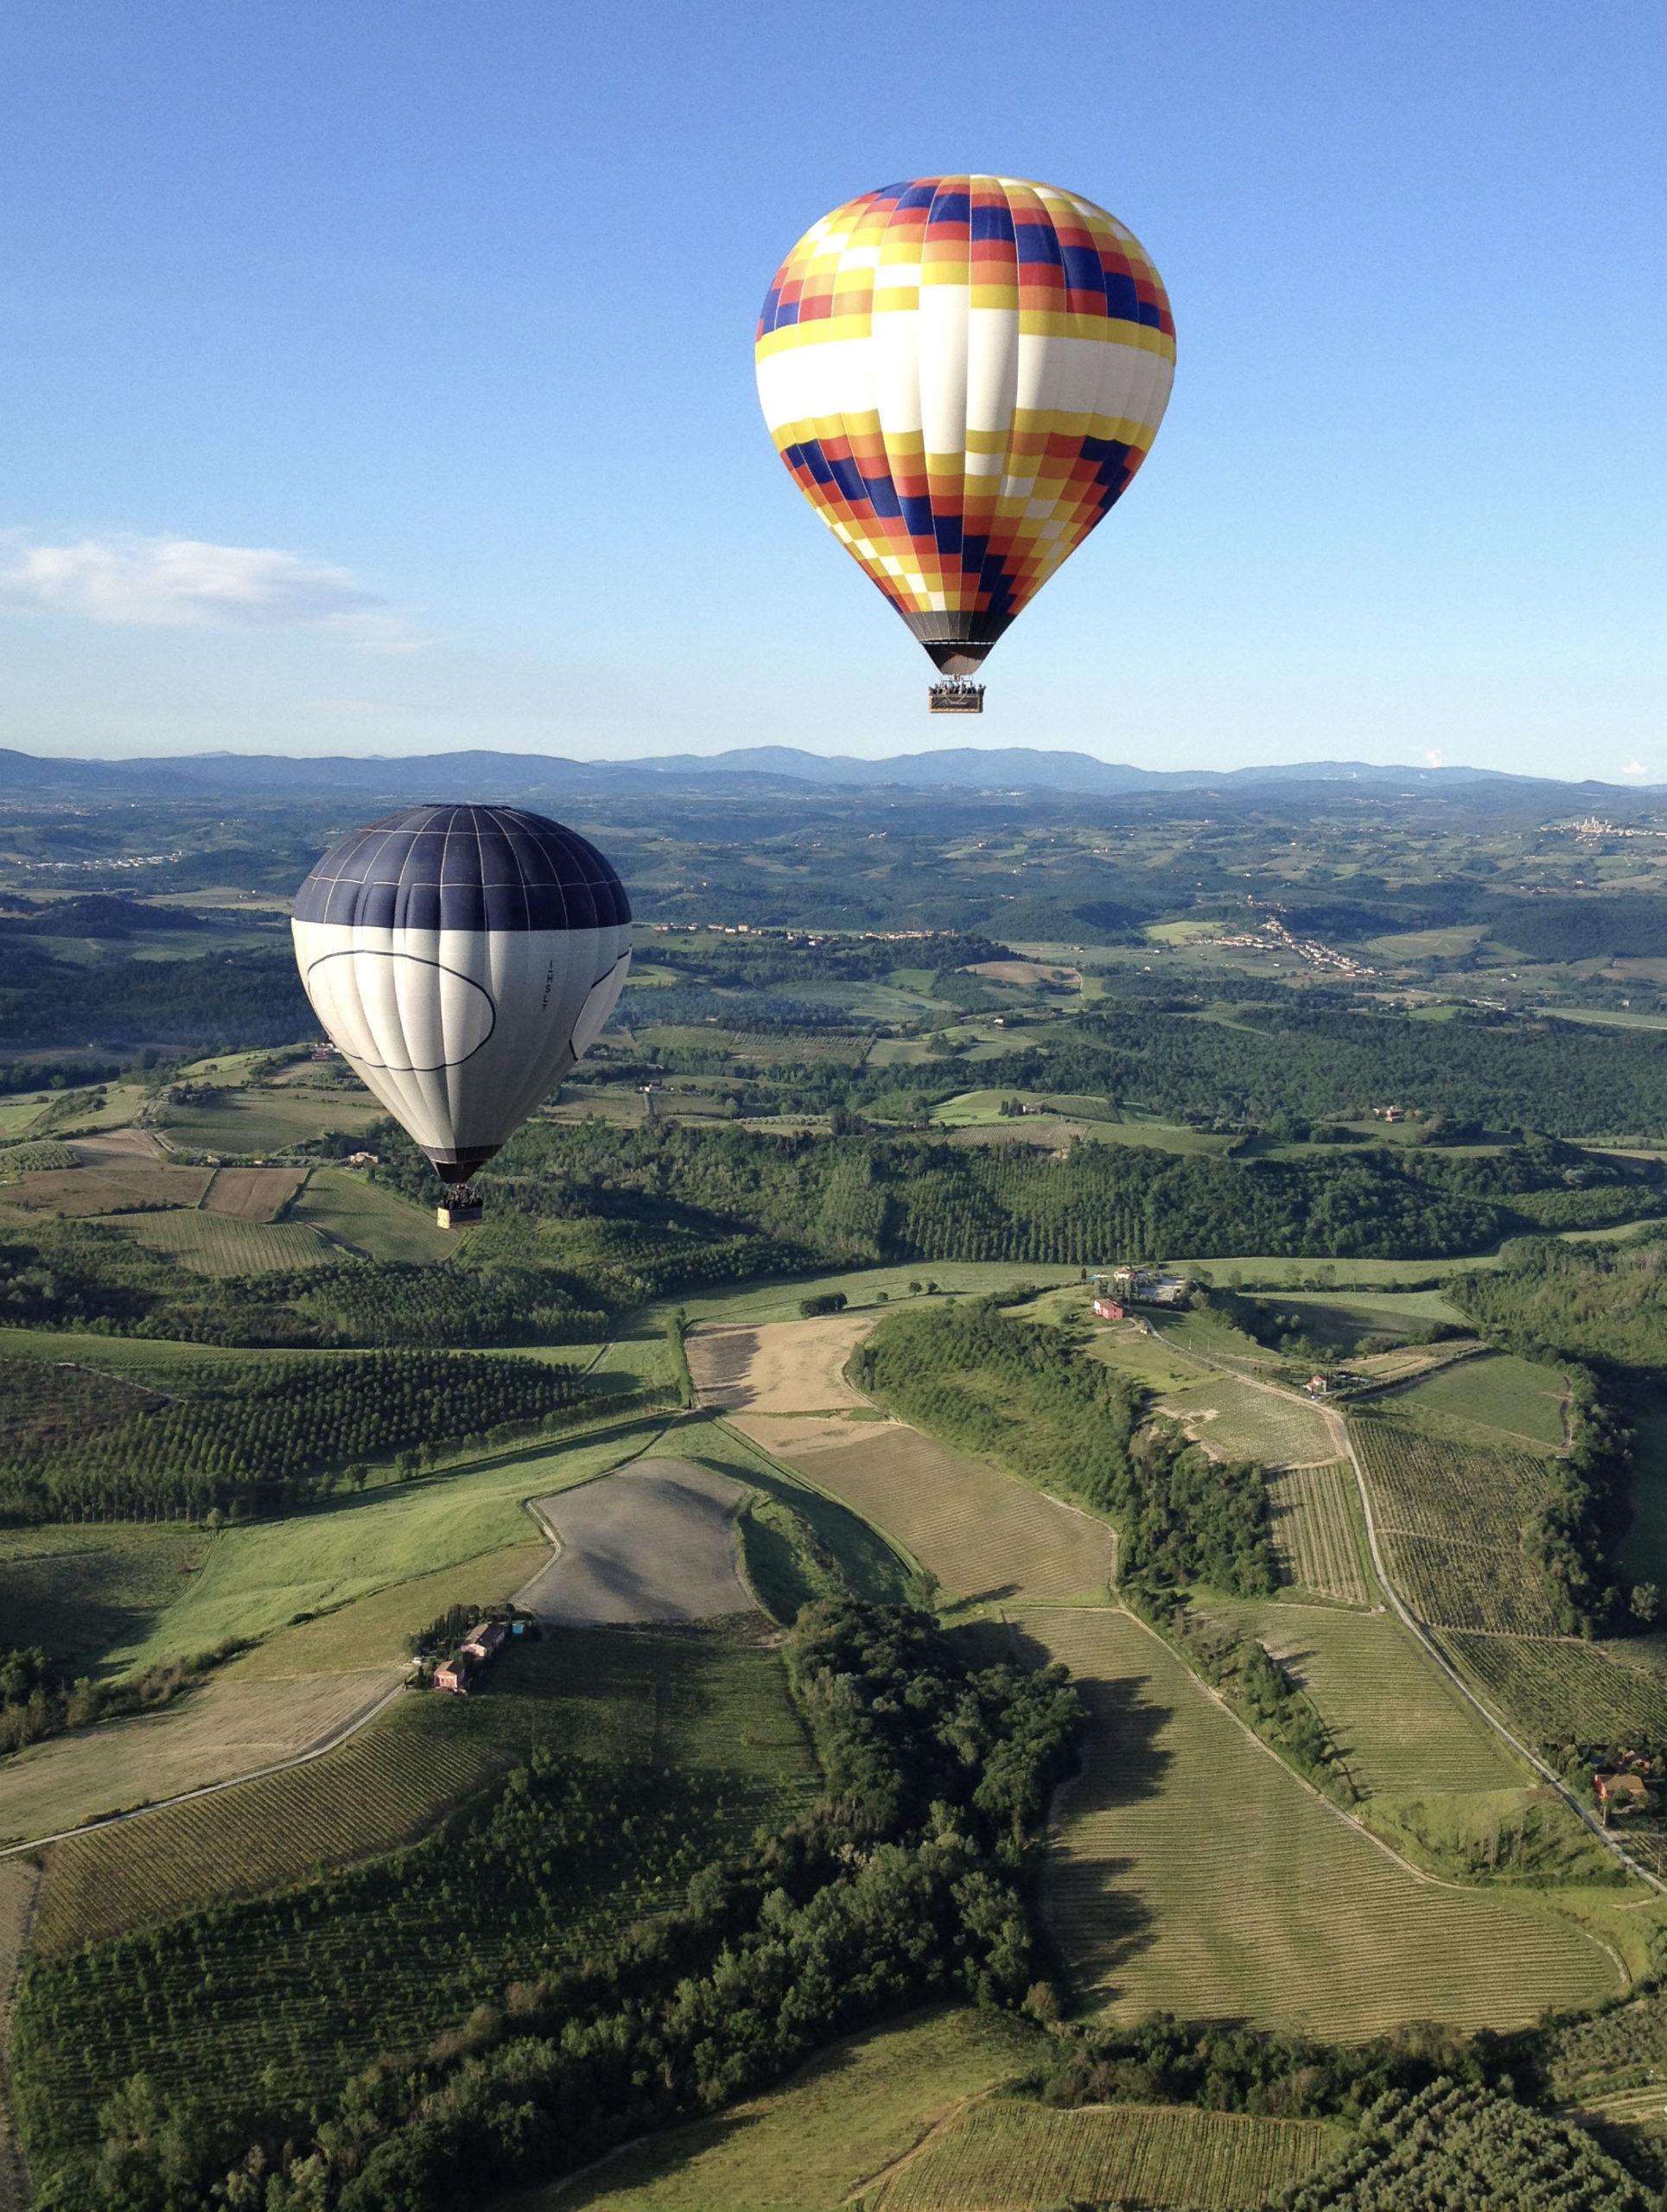 balloon-team-large-group-in-flight